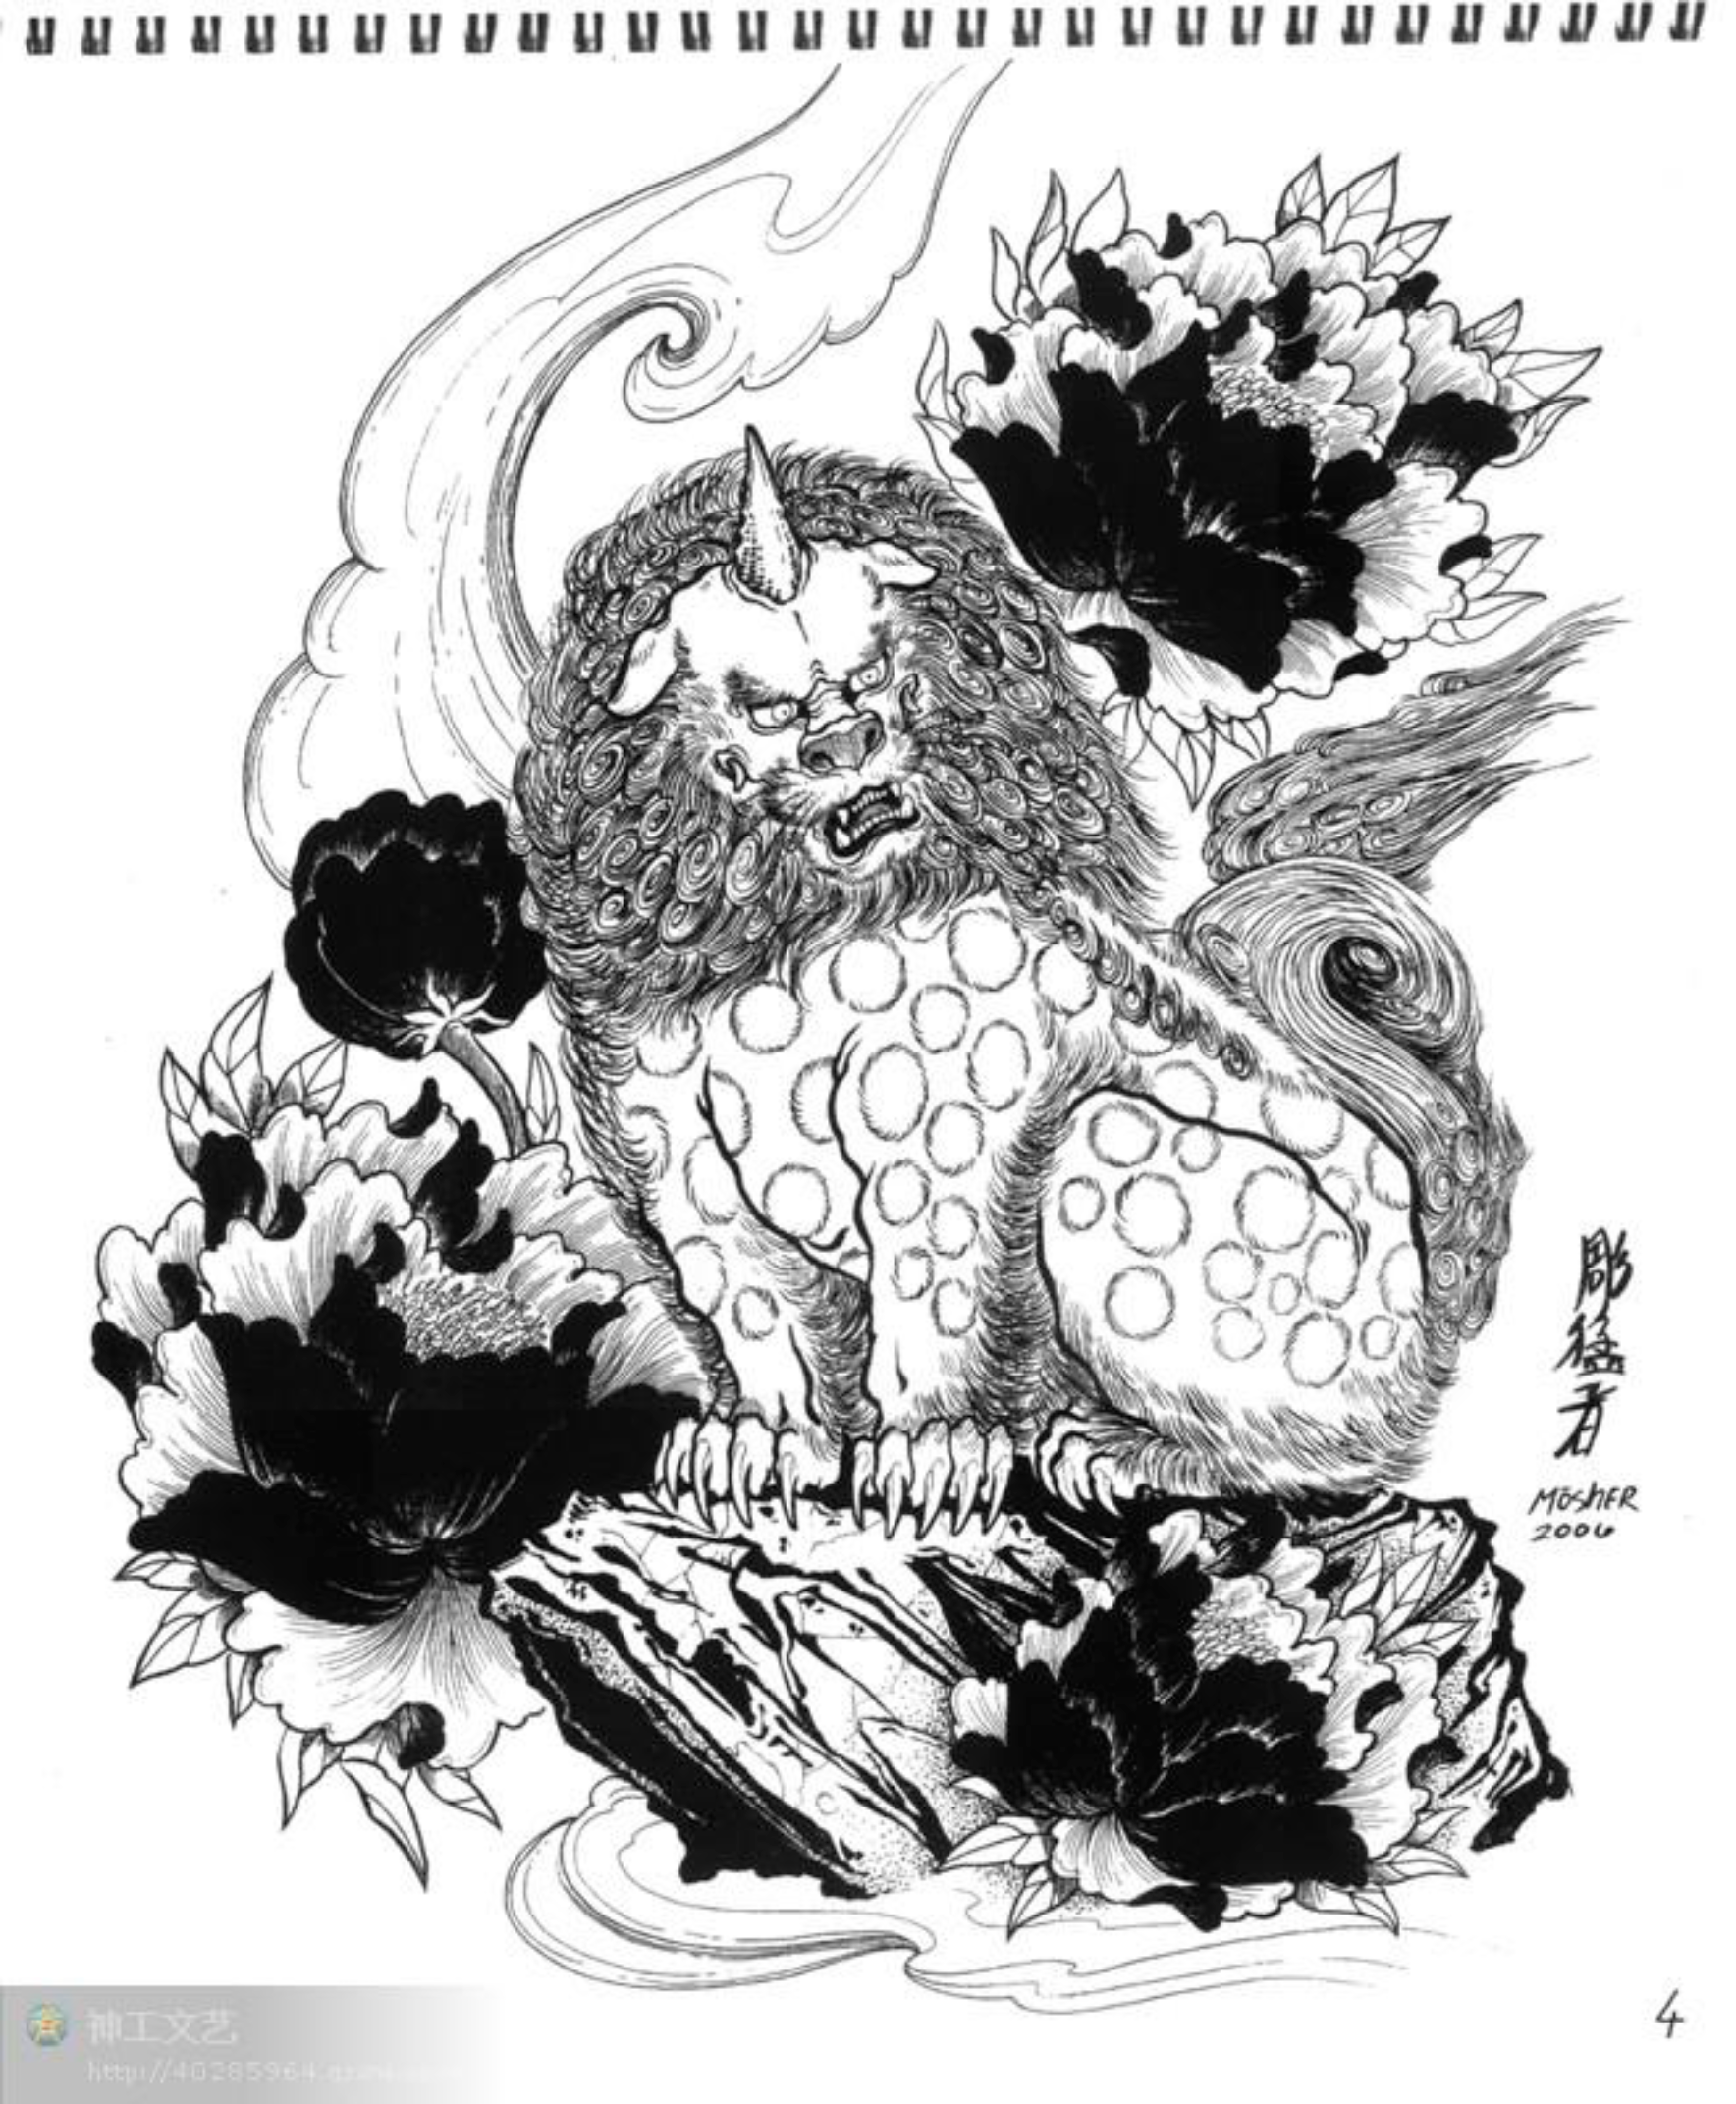 Flash Tattoos, Art Tattoos, Tattoo Designs, Black And White, Black